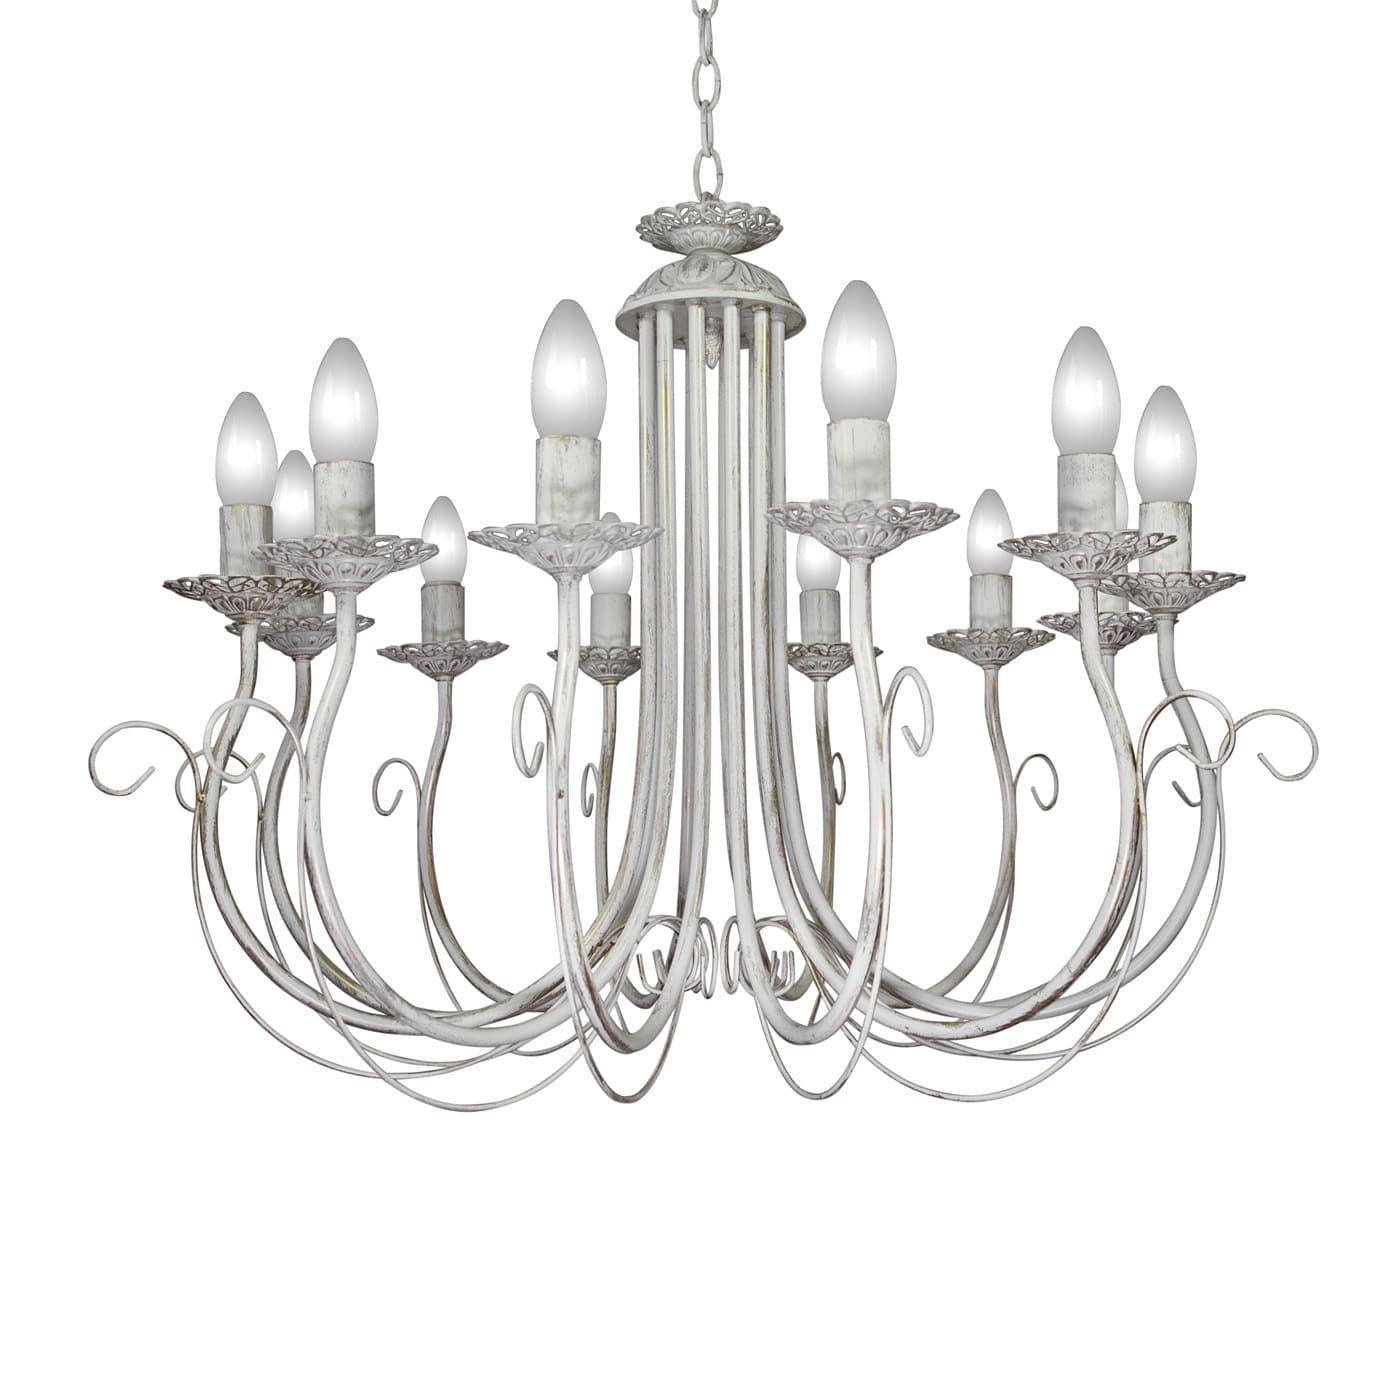 PETRASVET / Pendant chandelier S1166-12, 12xE14 max. 60W